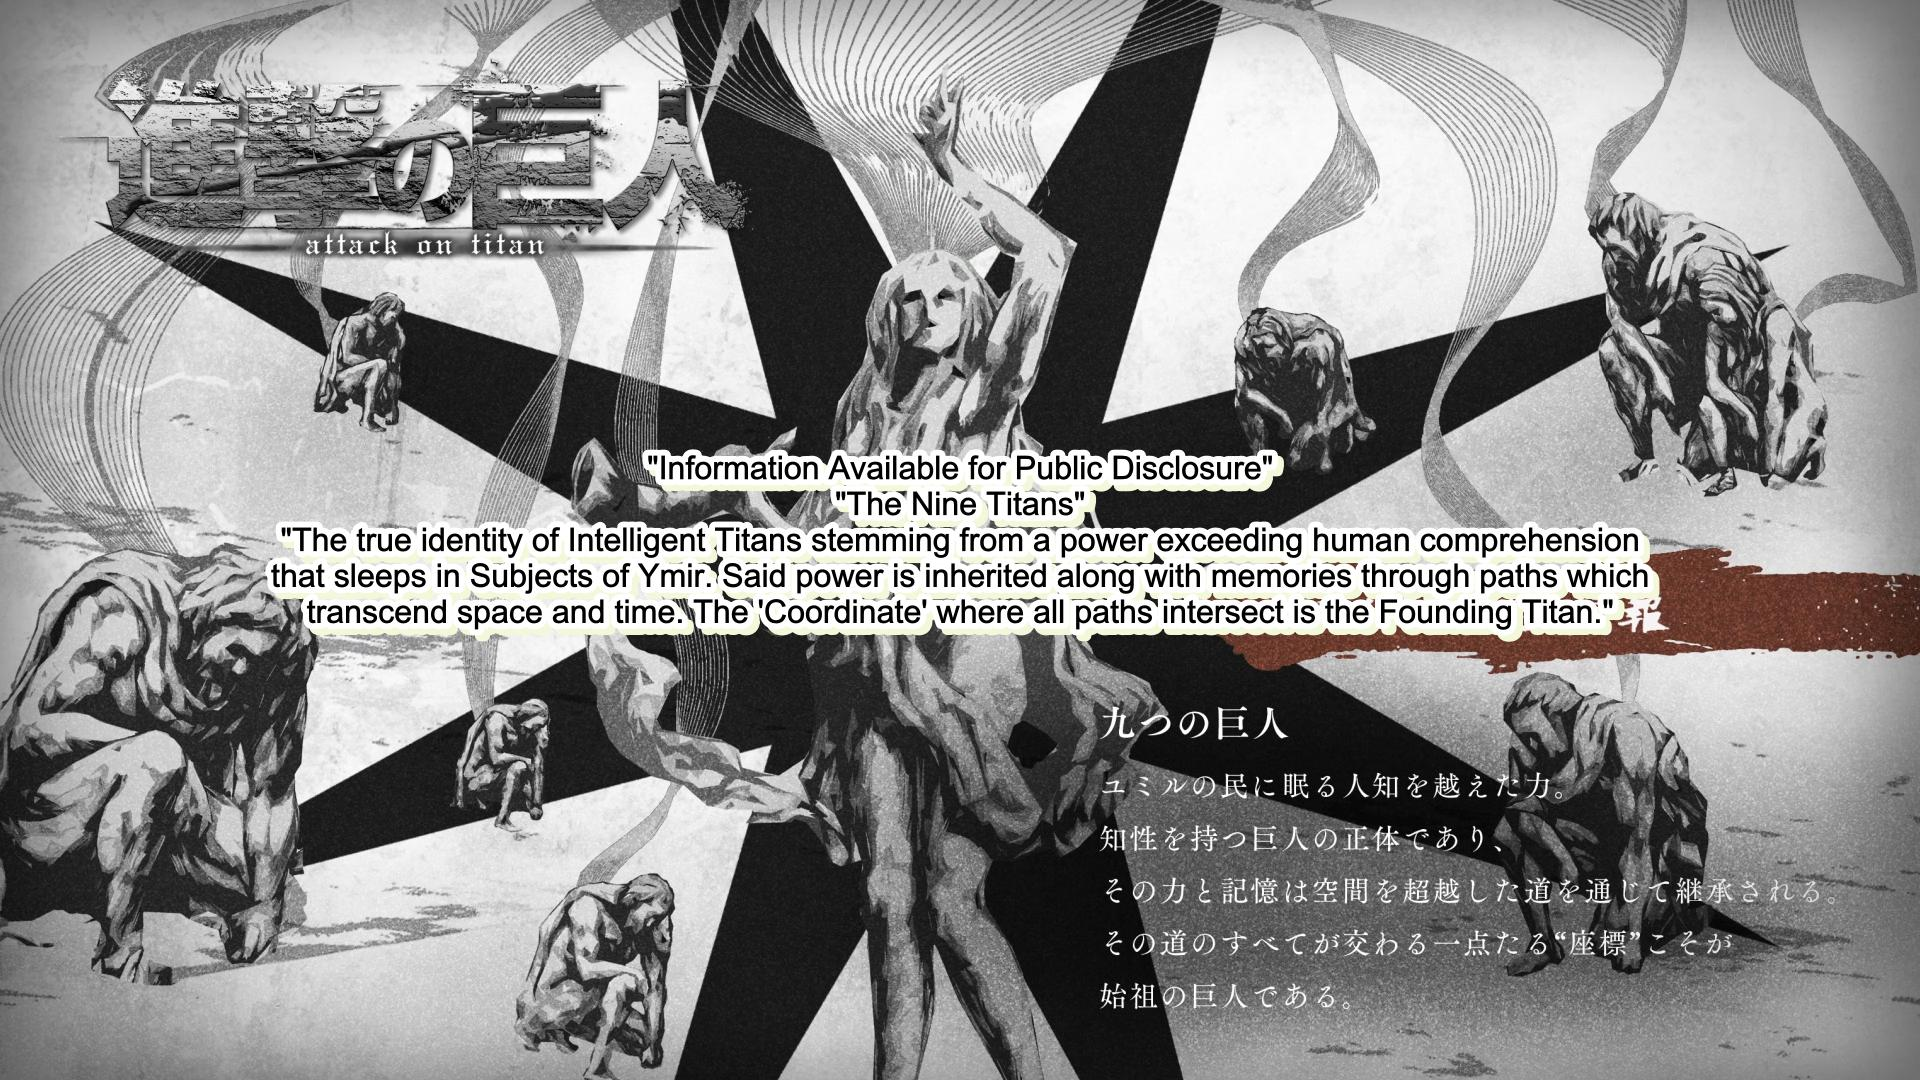 Attack On Titan Wiki On Twitter Attack On Titan Episode 58 Intermission Image